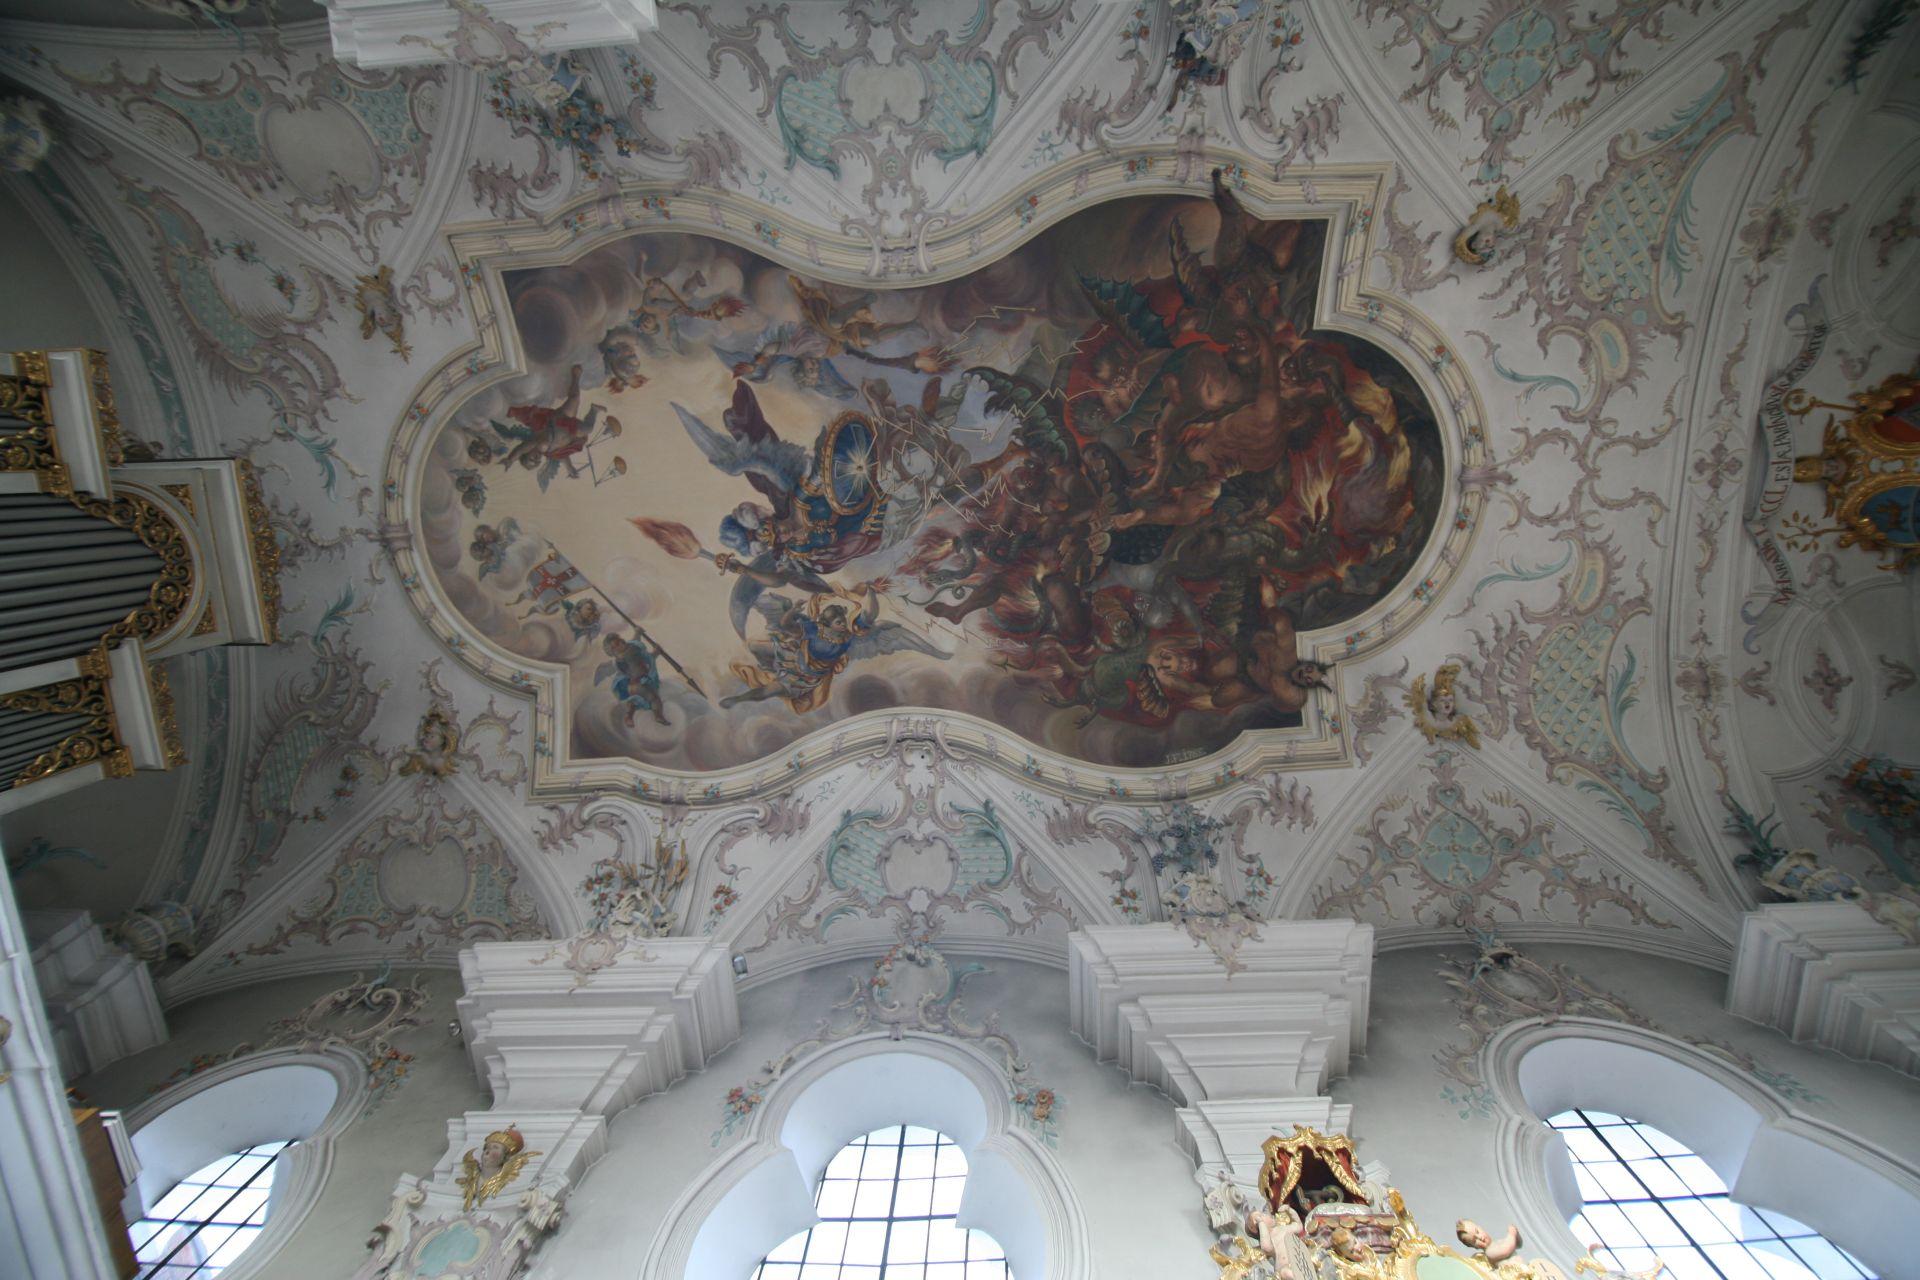 Kloster Paring